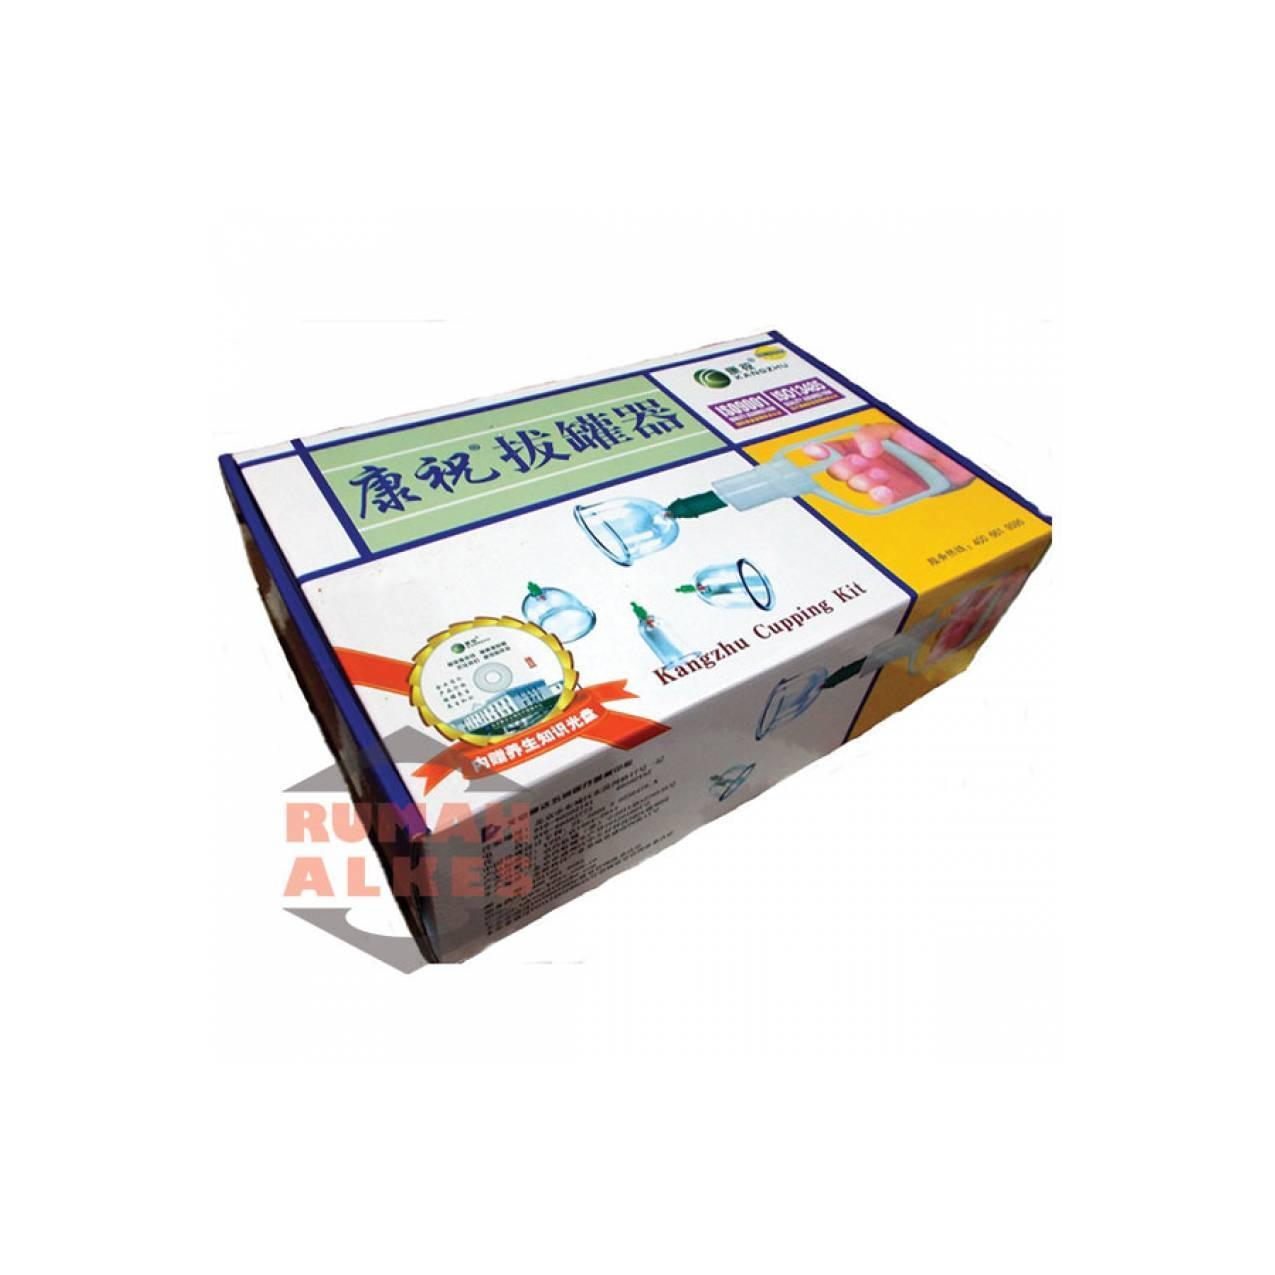 Kang Zhu Alat Bekam Kop Isi 12 Cup7 Harga Terkini Dan Jual Atau Angin Merk Kangzhu Hargalokacom